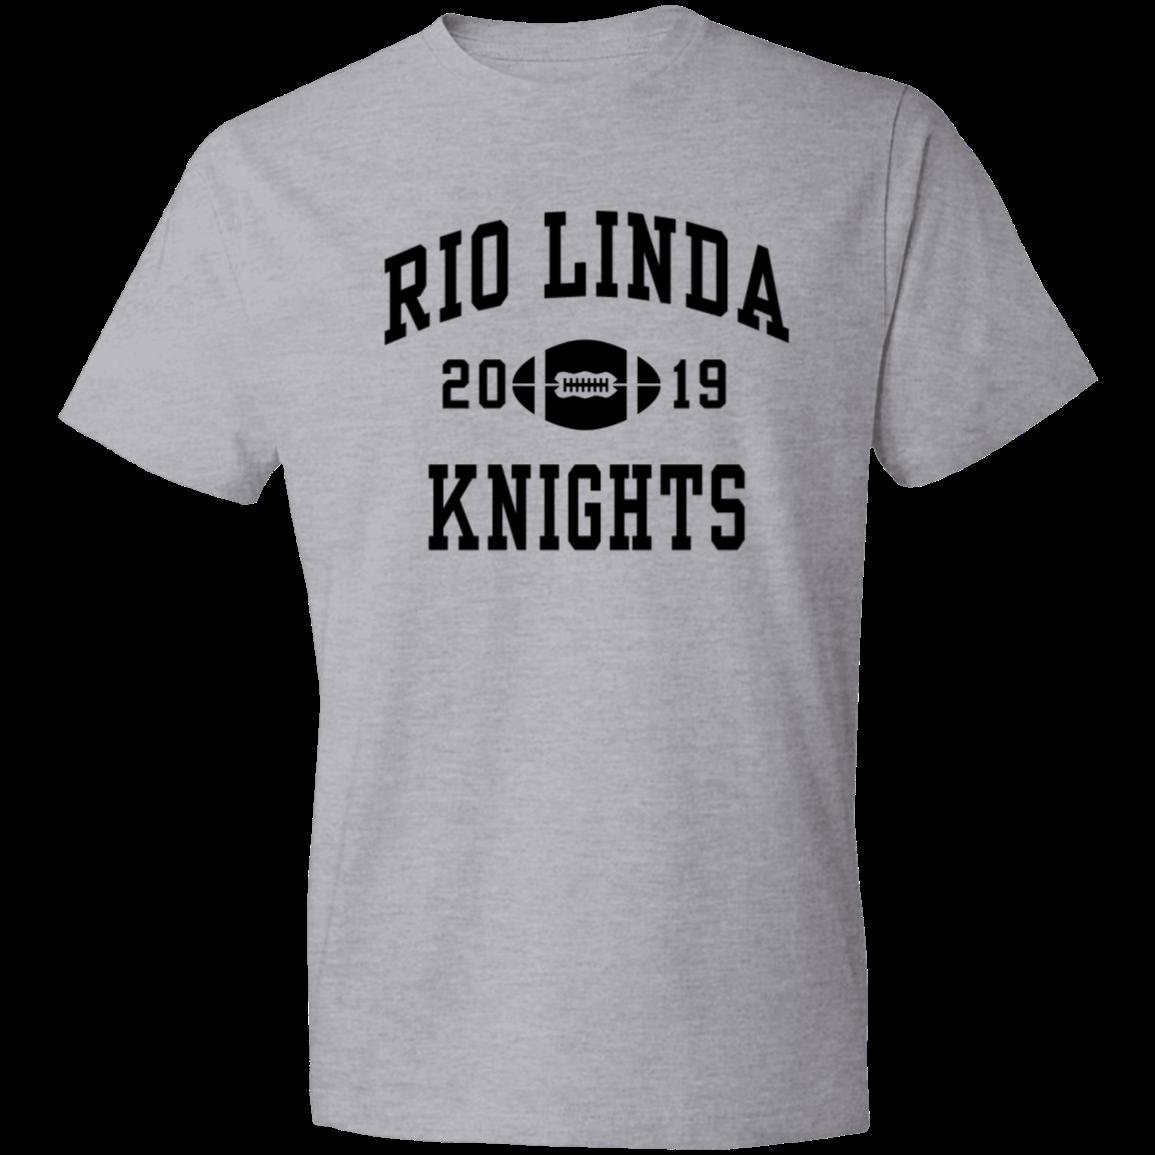 Rio Linda High School Anvil Lightweight Tshirt 45 Oz Spiritshop